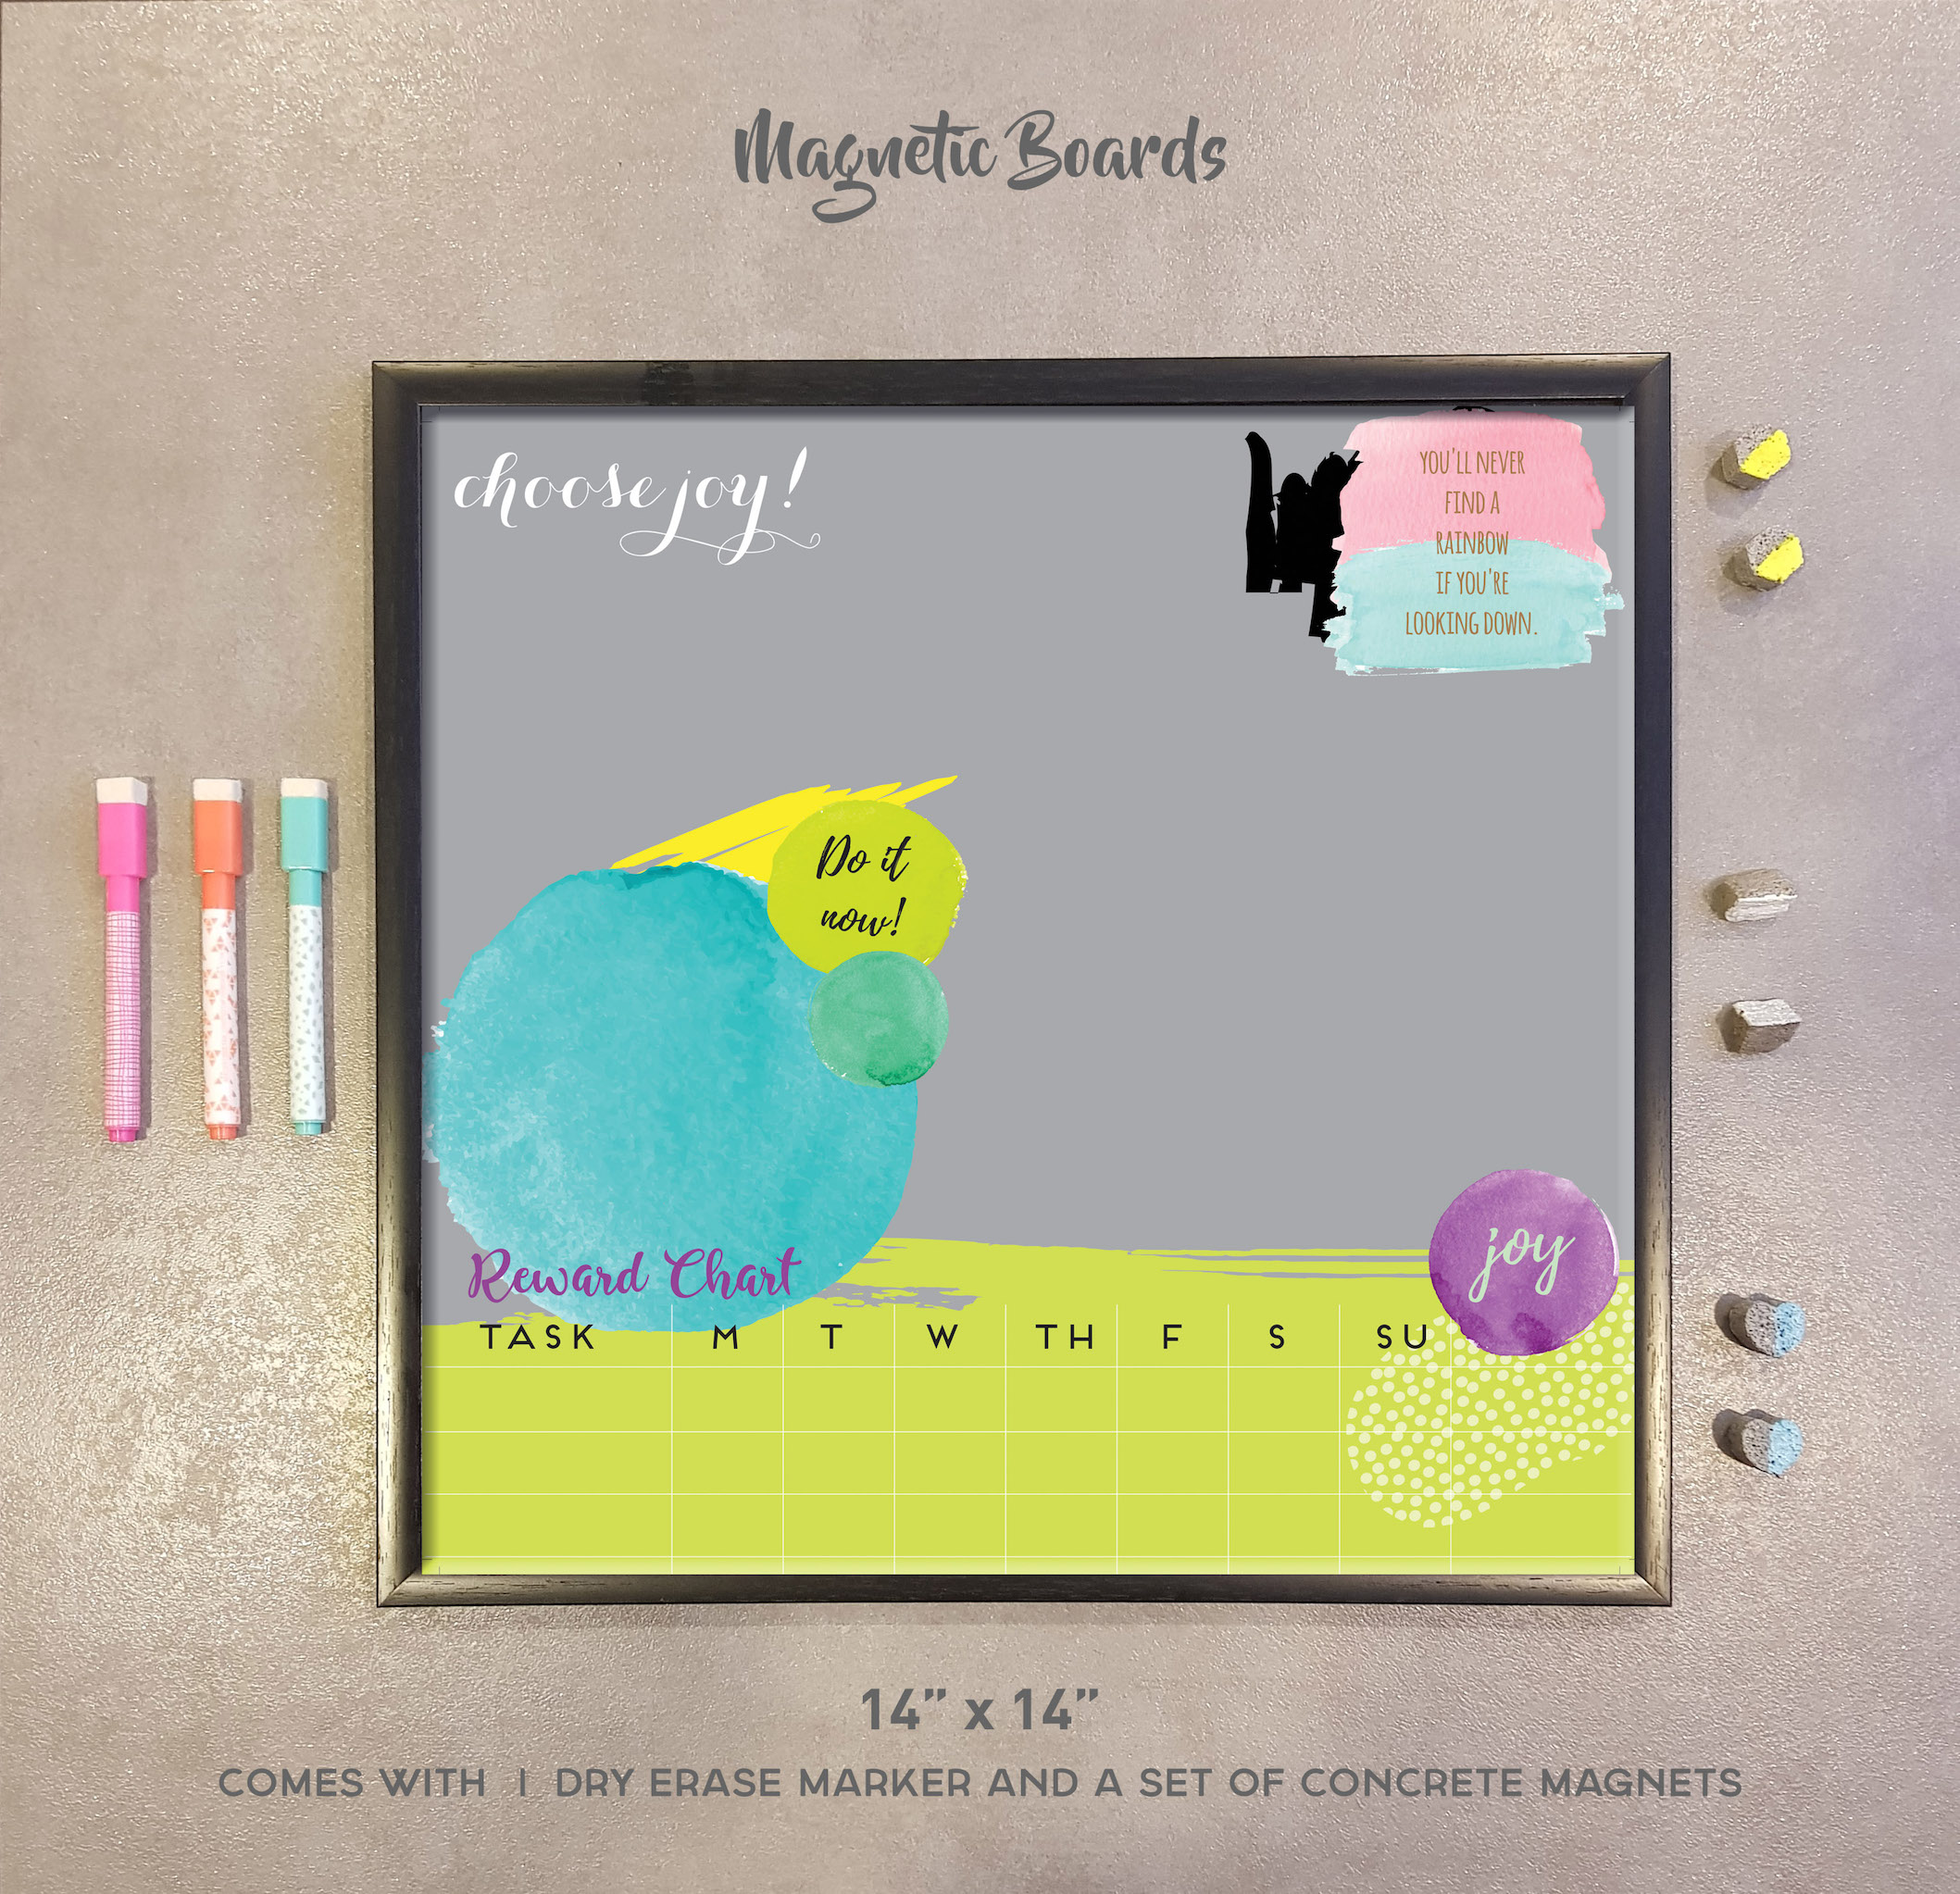 magnetic board insta post.jpg